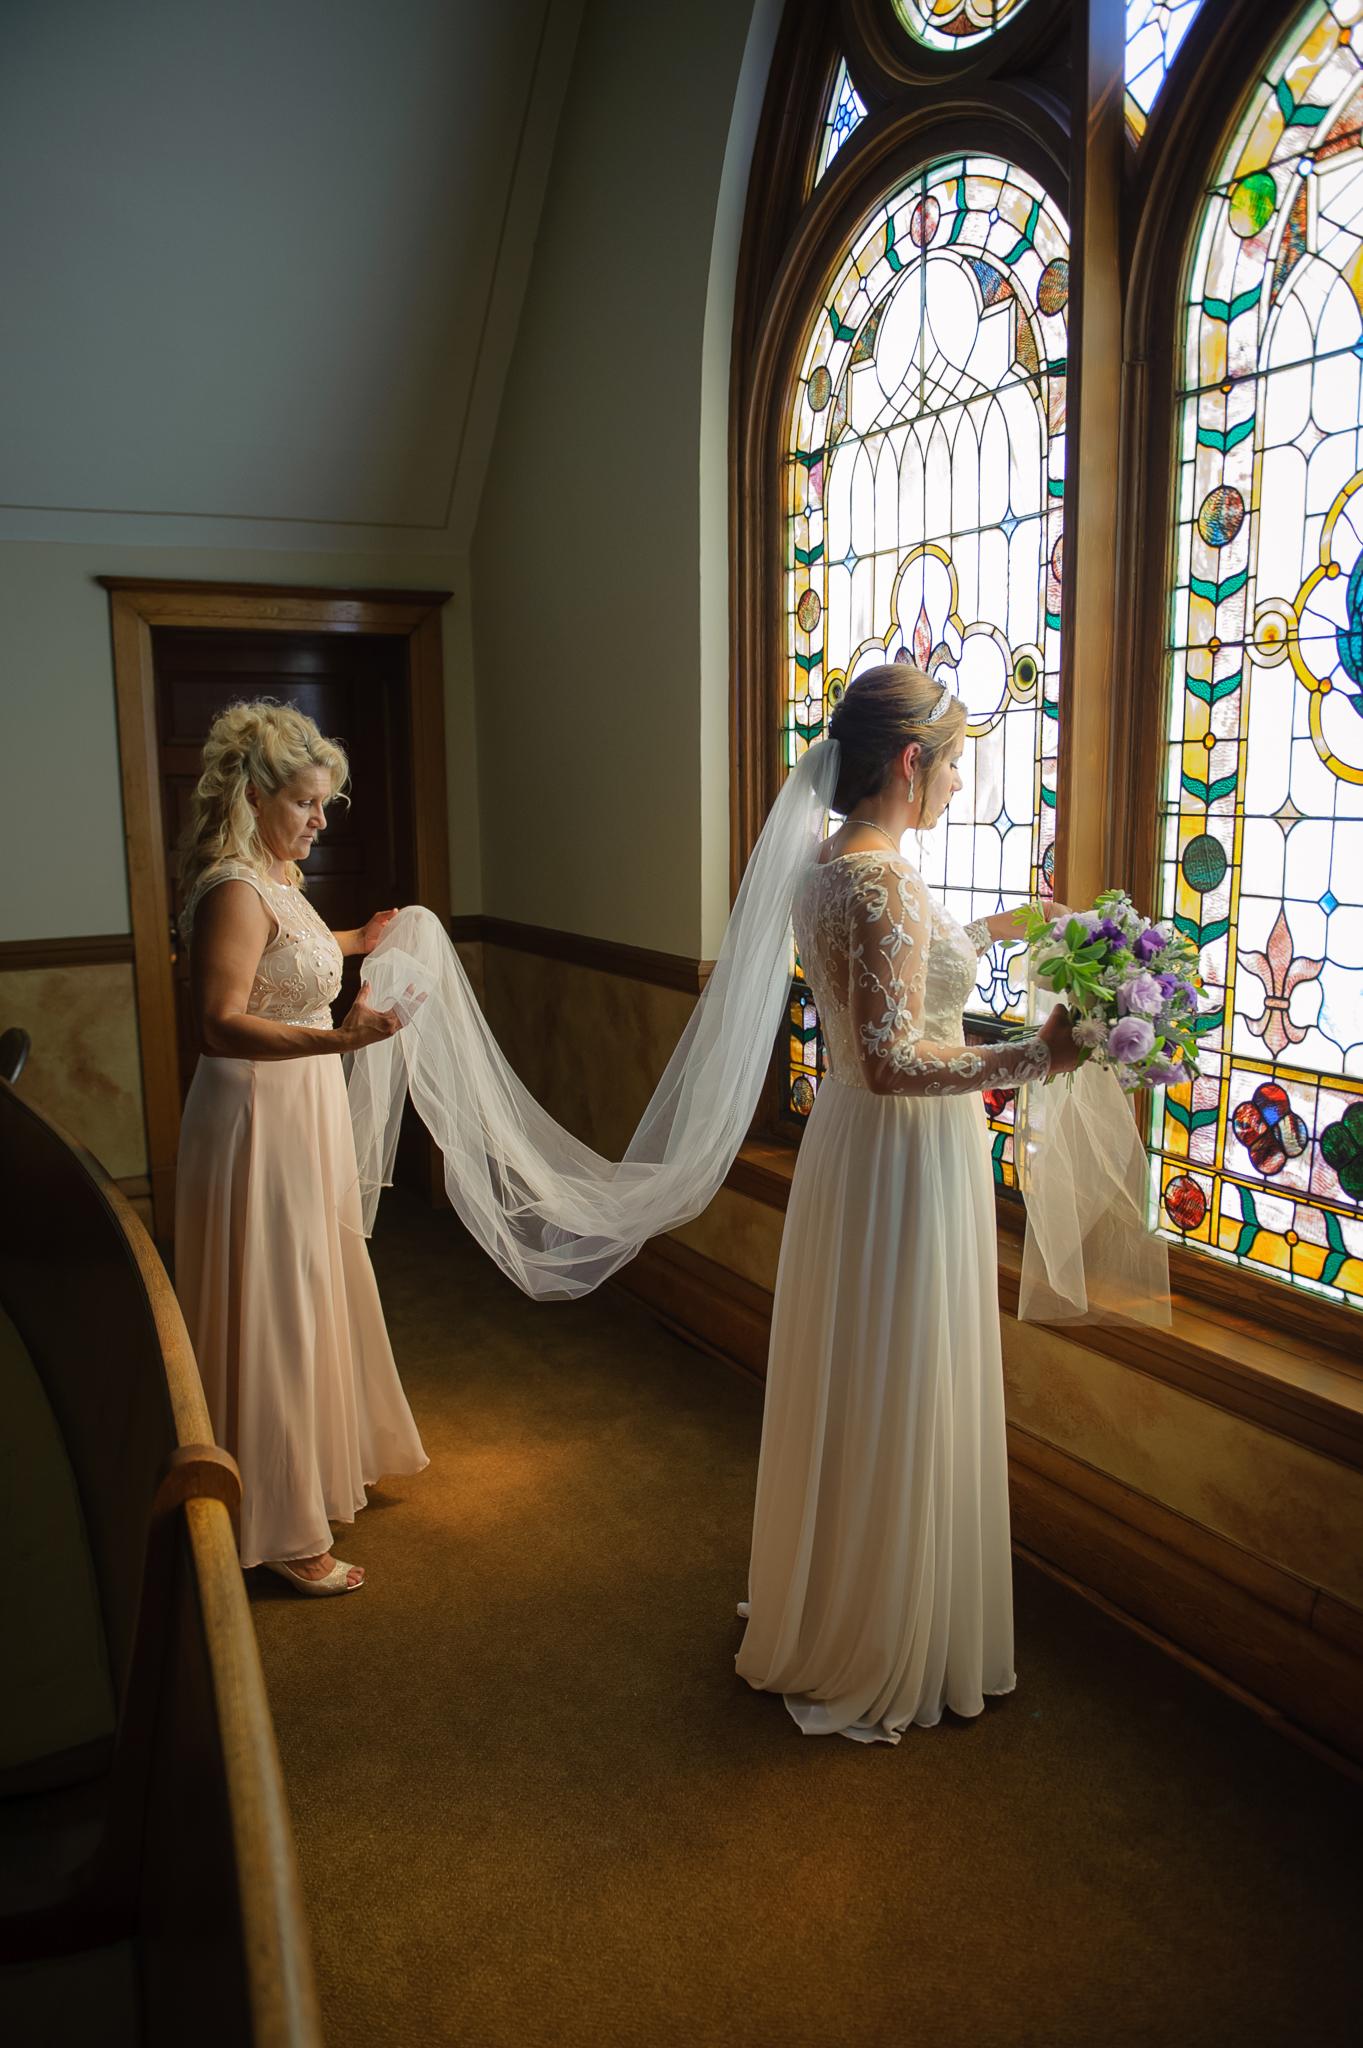 2-ashland washburn wedding photography700_4820.jpg